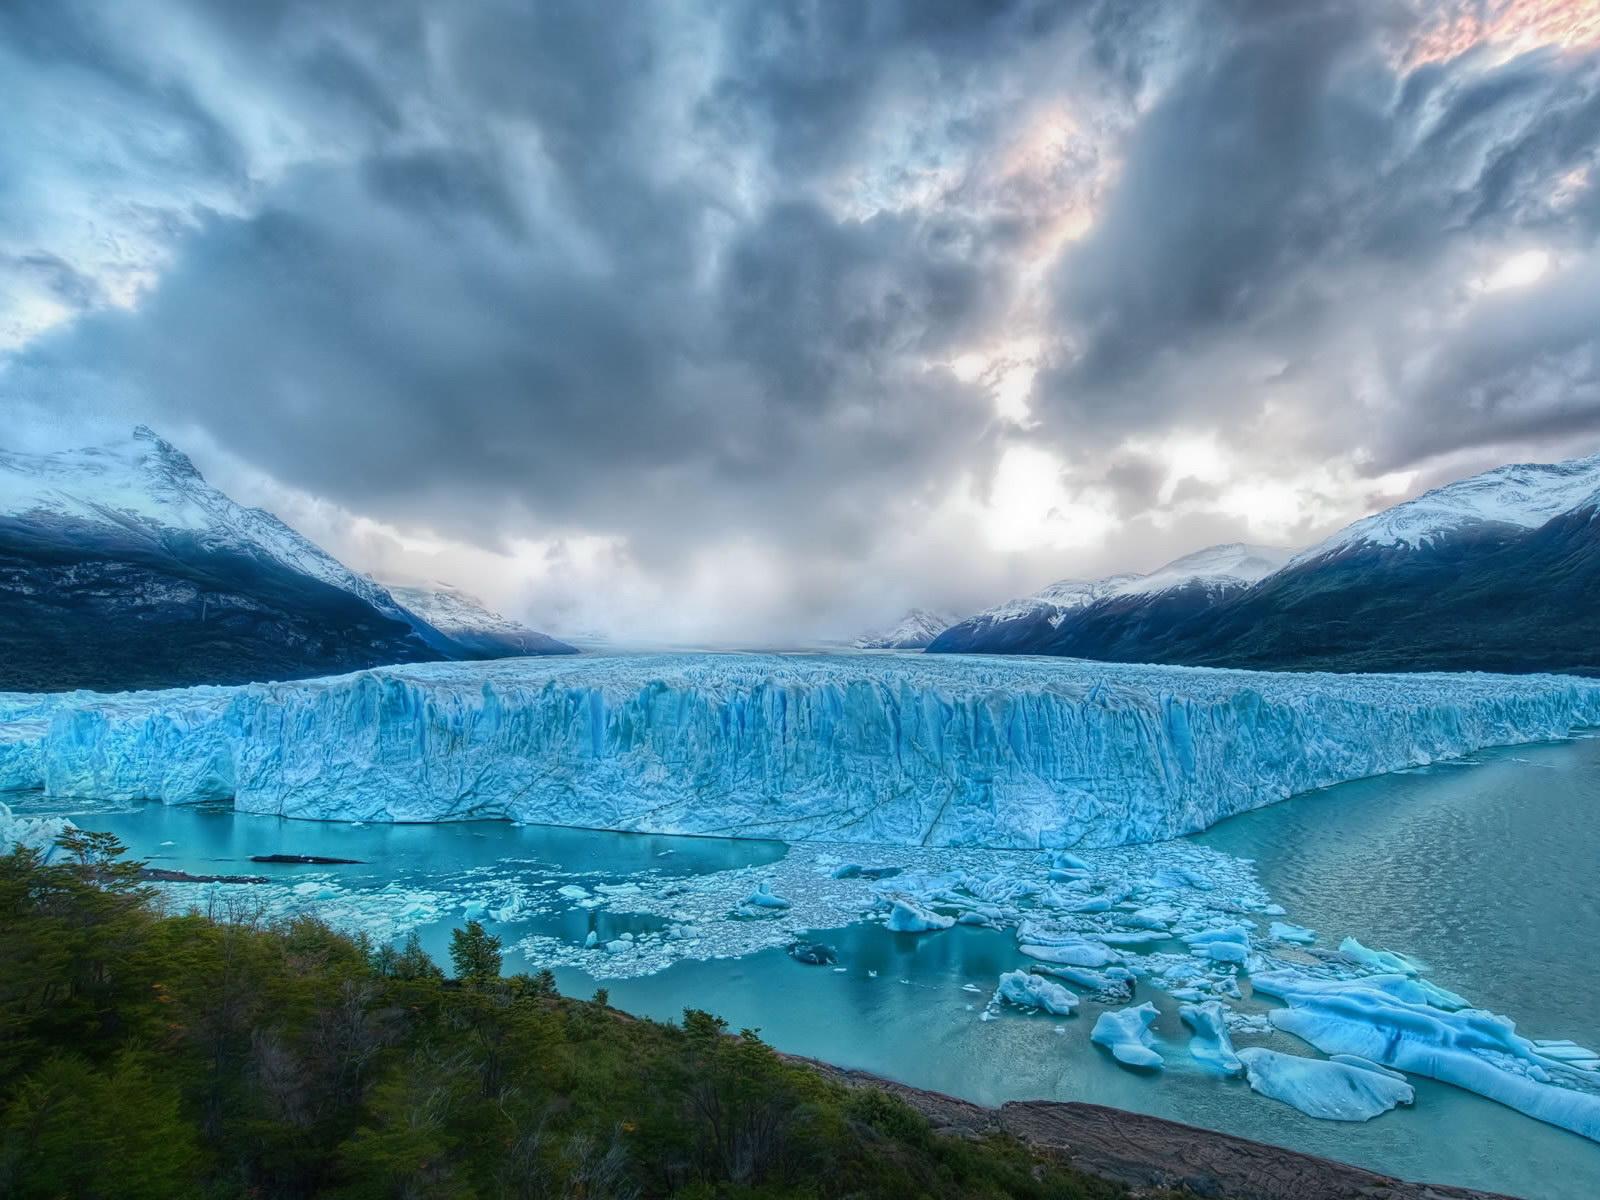 Frozen Lake    Top Wallpapers Download .blogspot.com